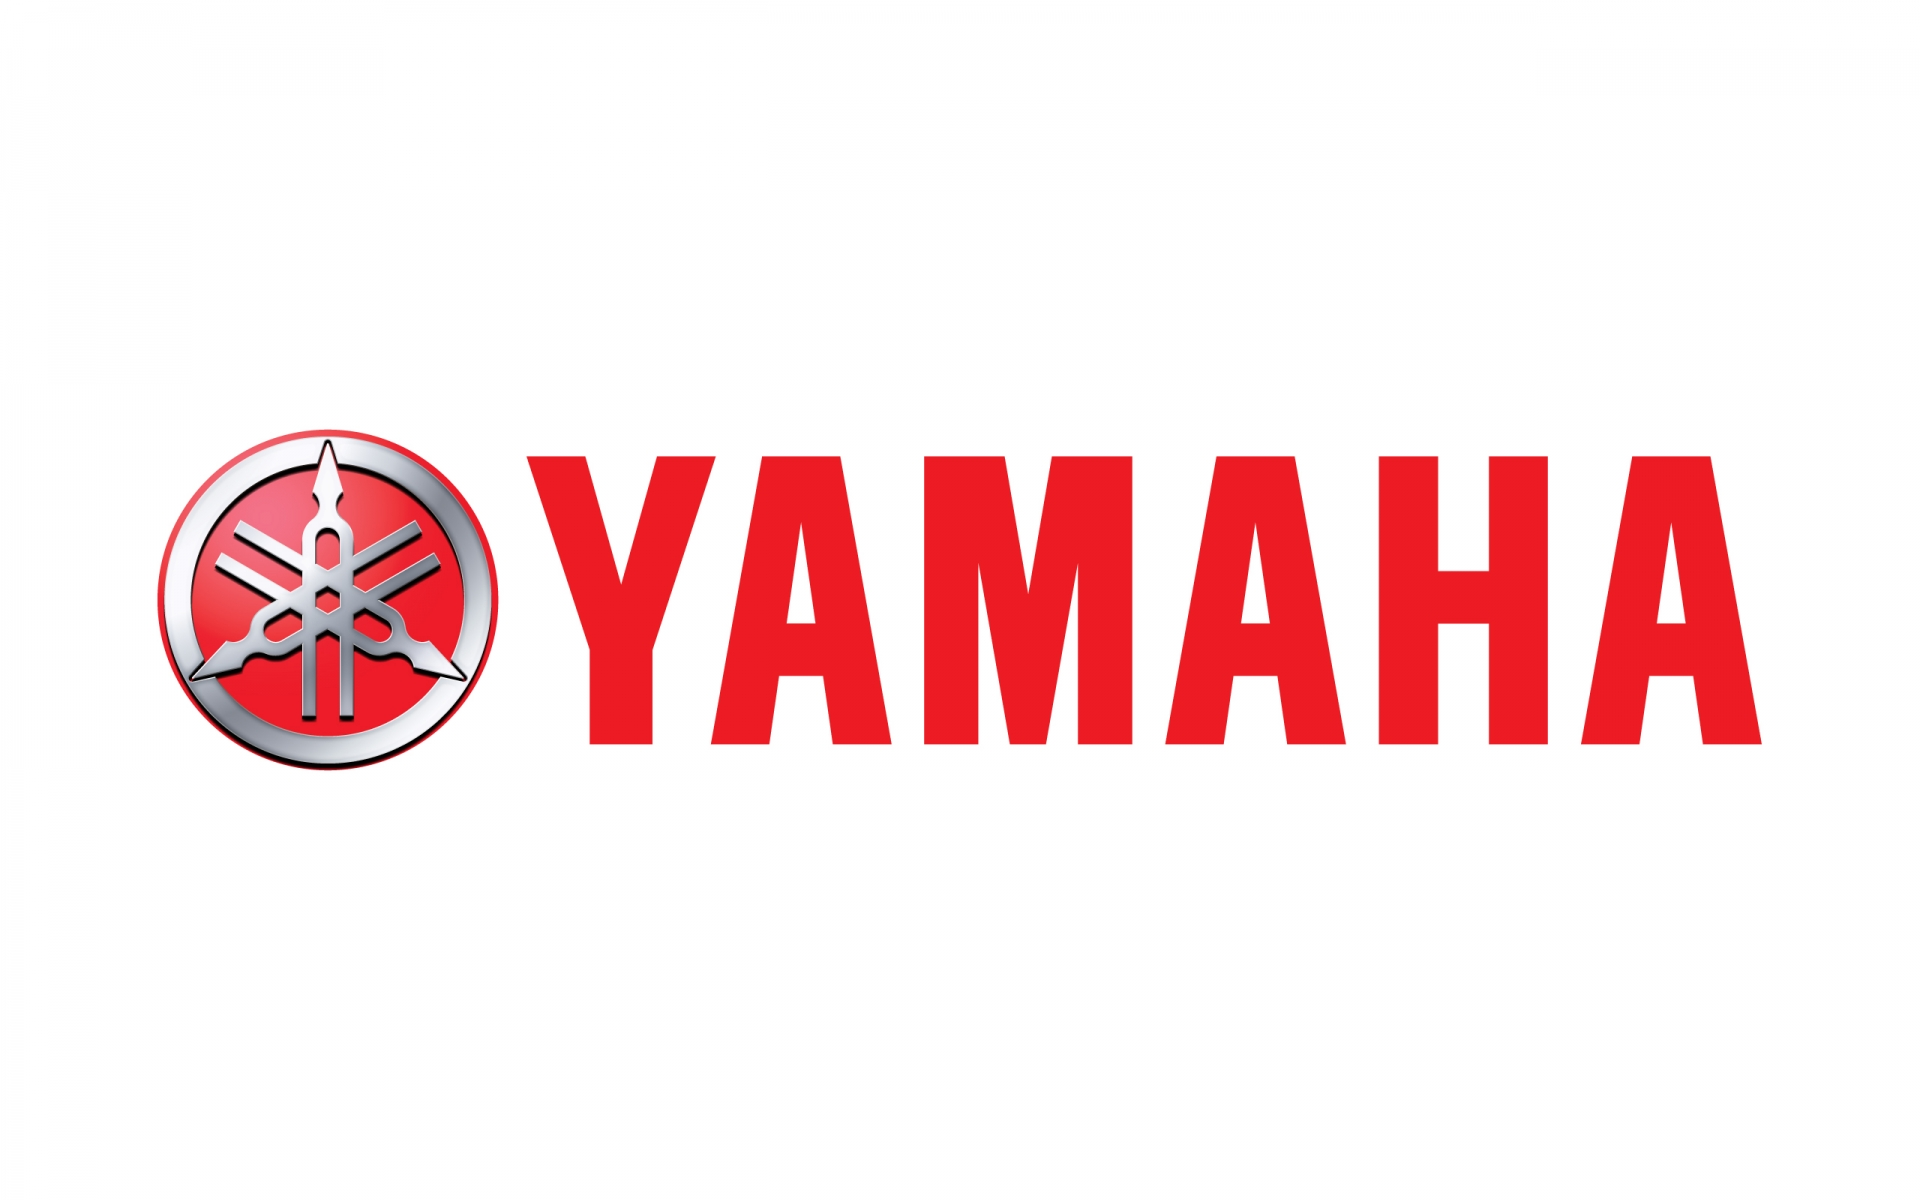 Yamaha Logo Wallpaper Yamaha Motor Australia 1920x1200